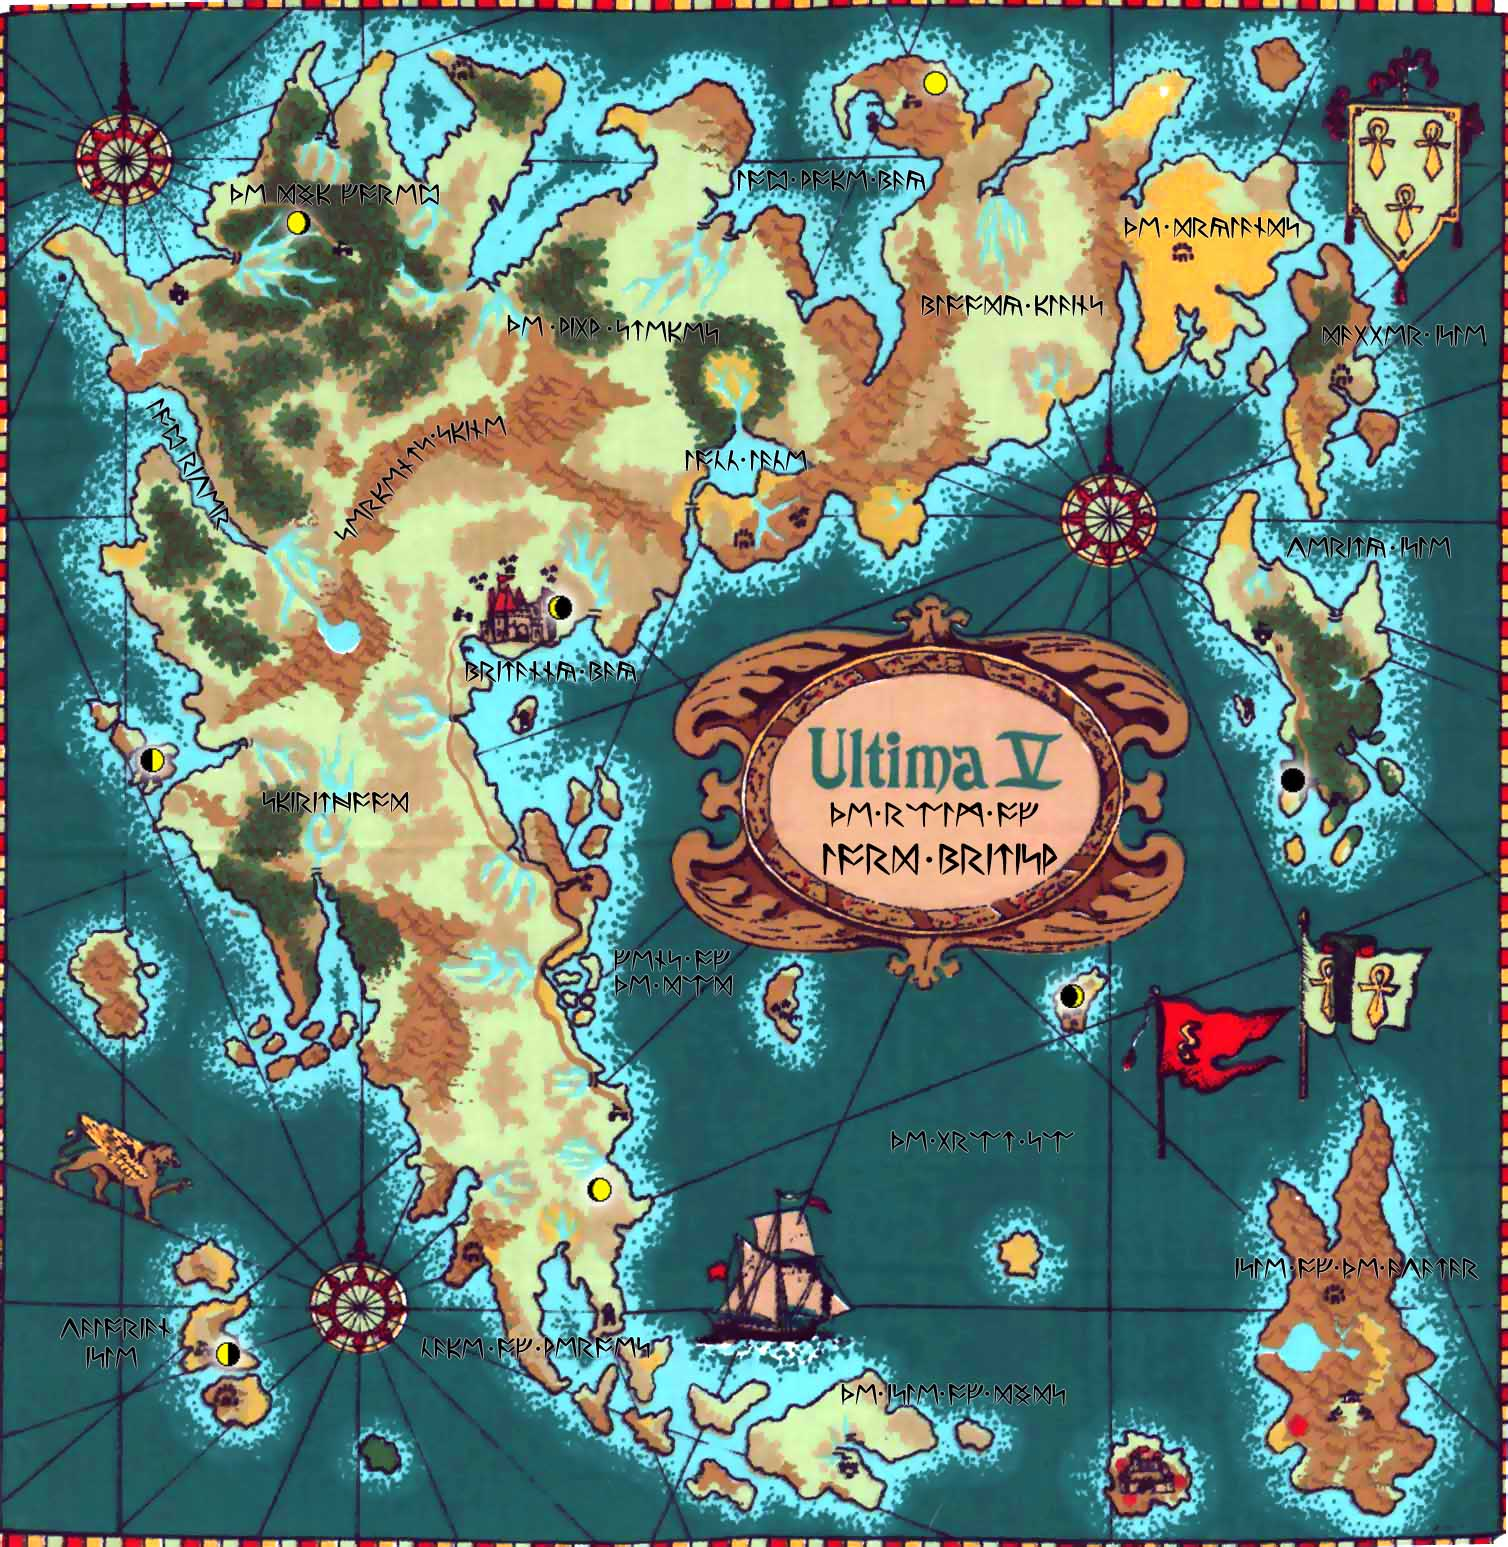 Dino's Ultima 5 Guide on ultima 4 map, ultima v nes map, ultima underworld abyss map, ultima online map, ultima underworld the stygian abyss ps1,